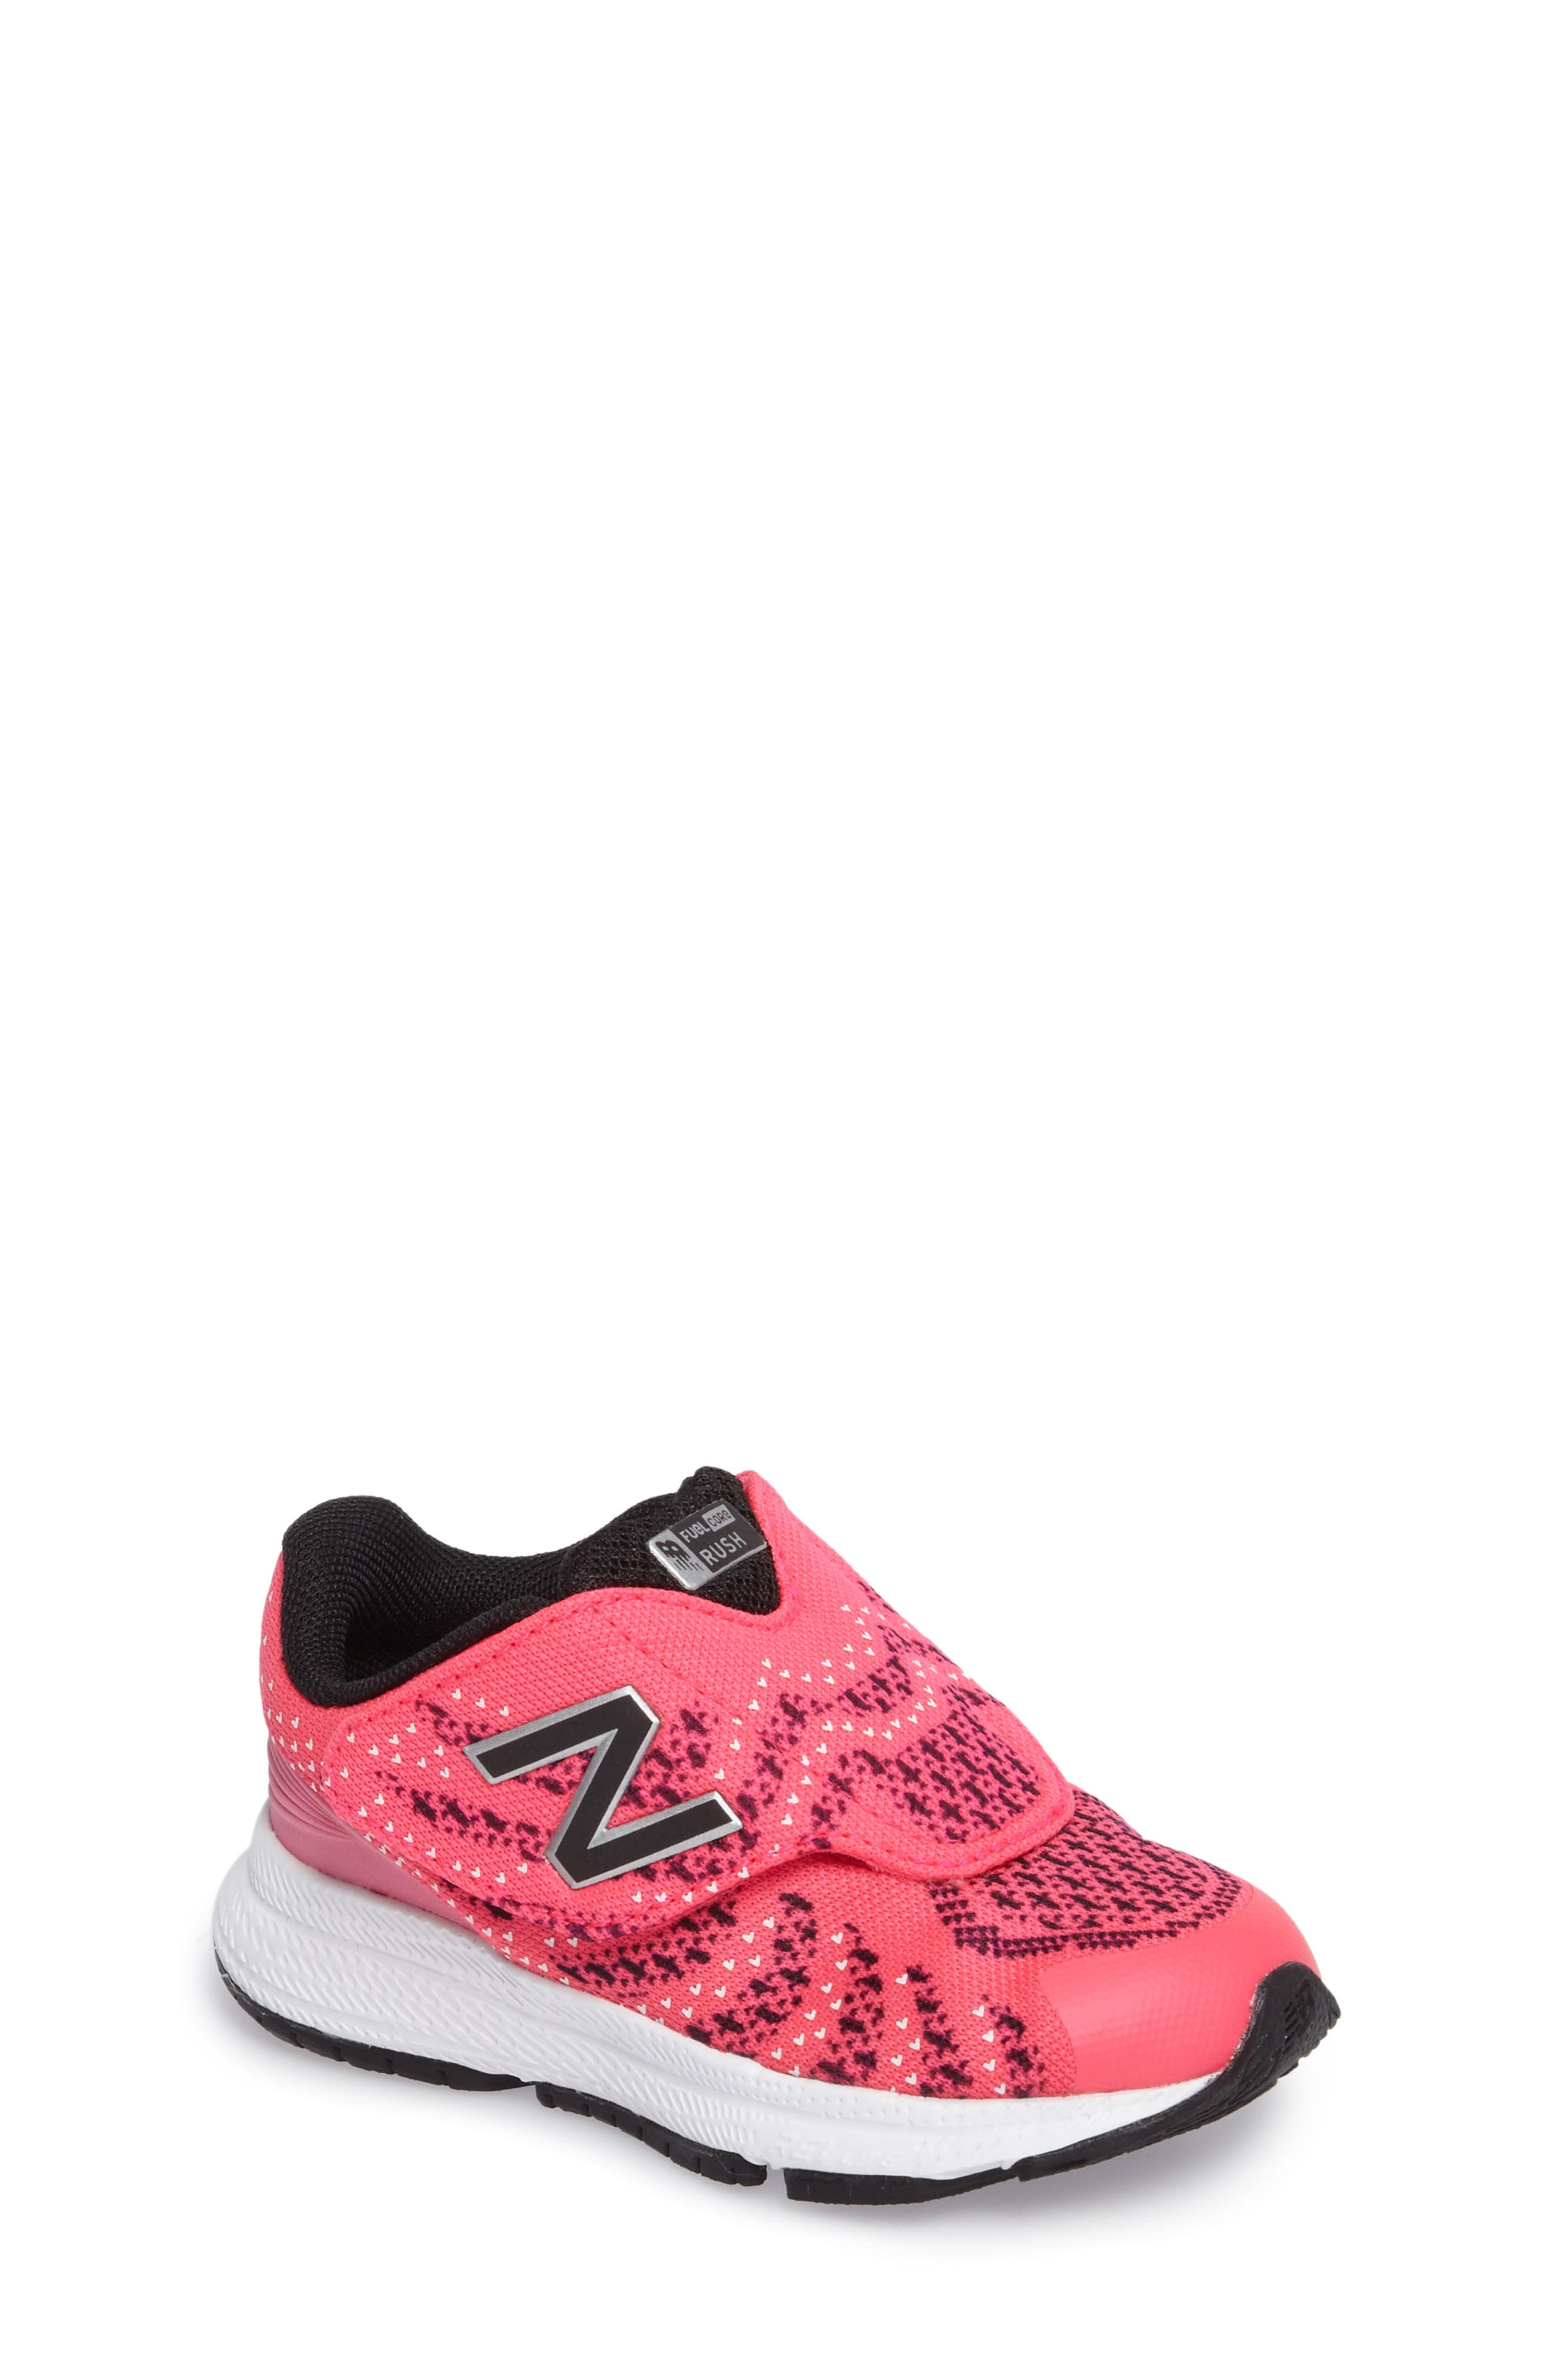 FuelCore Rush v3 Knit Sneaker,                             Main thumbnail 1, color,                             650